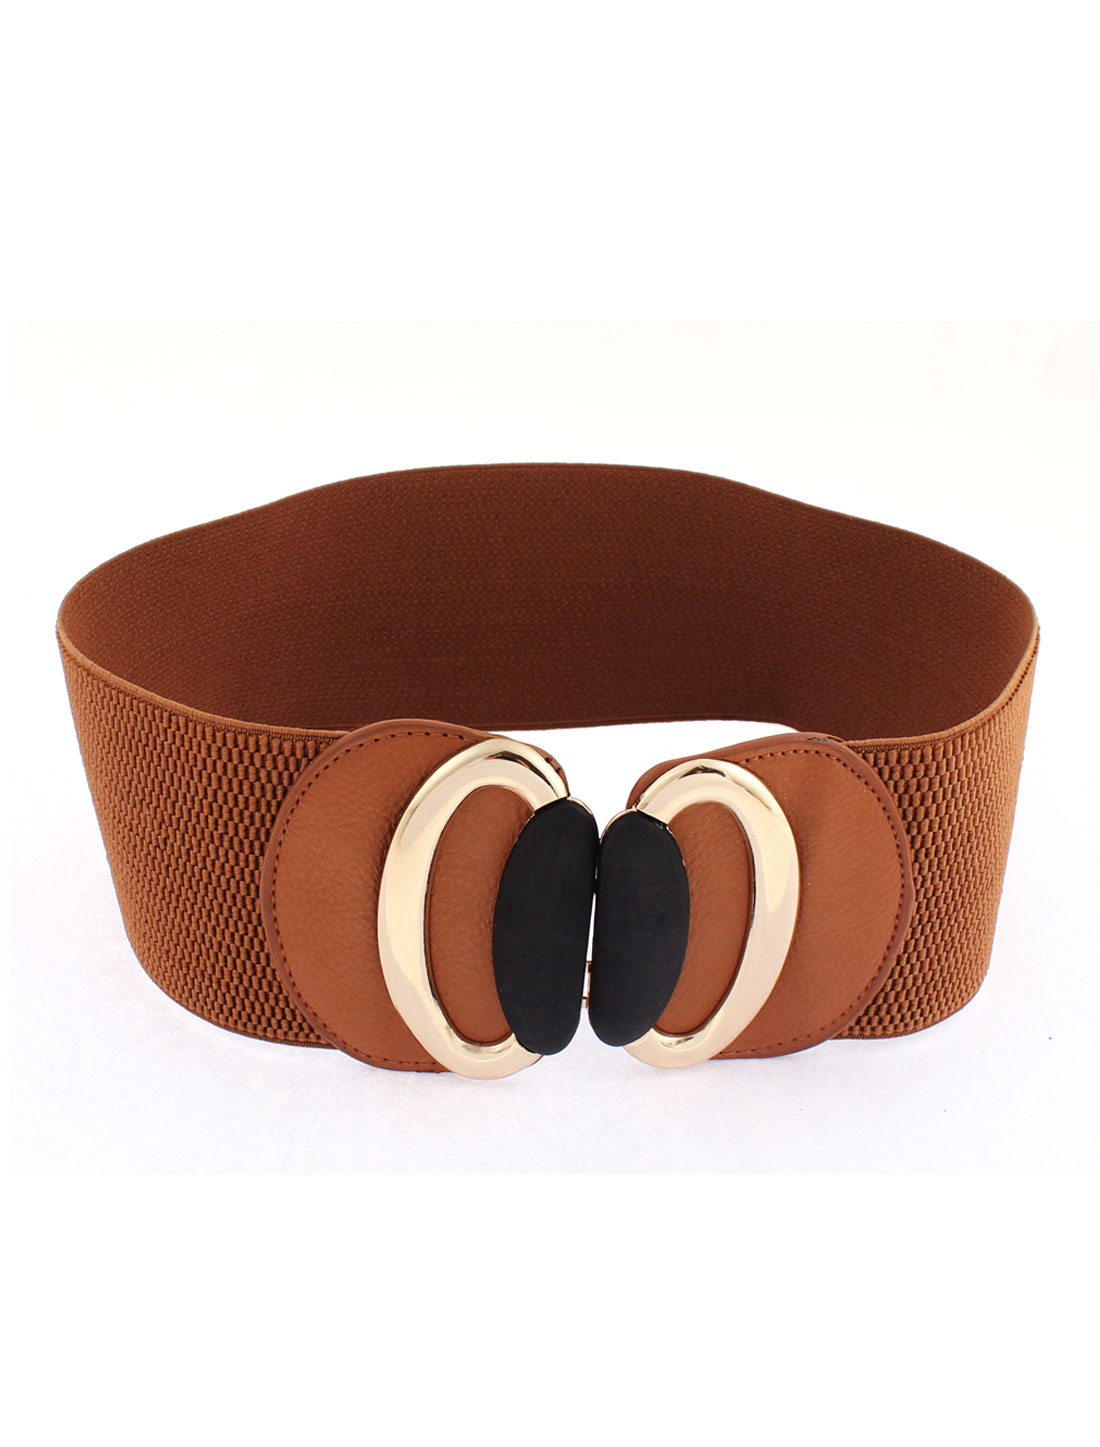 Adjustable Elastic Wide Waistband Waist Belt Camel Color for Women